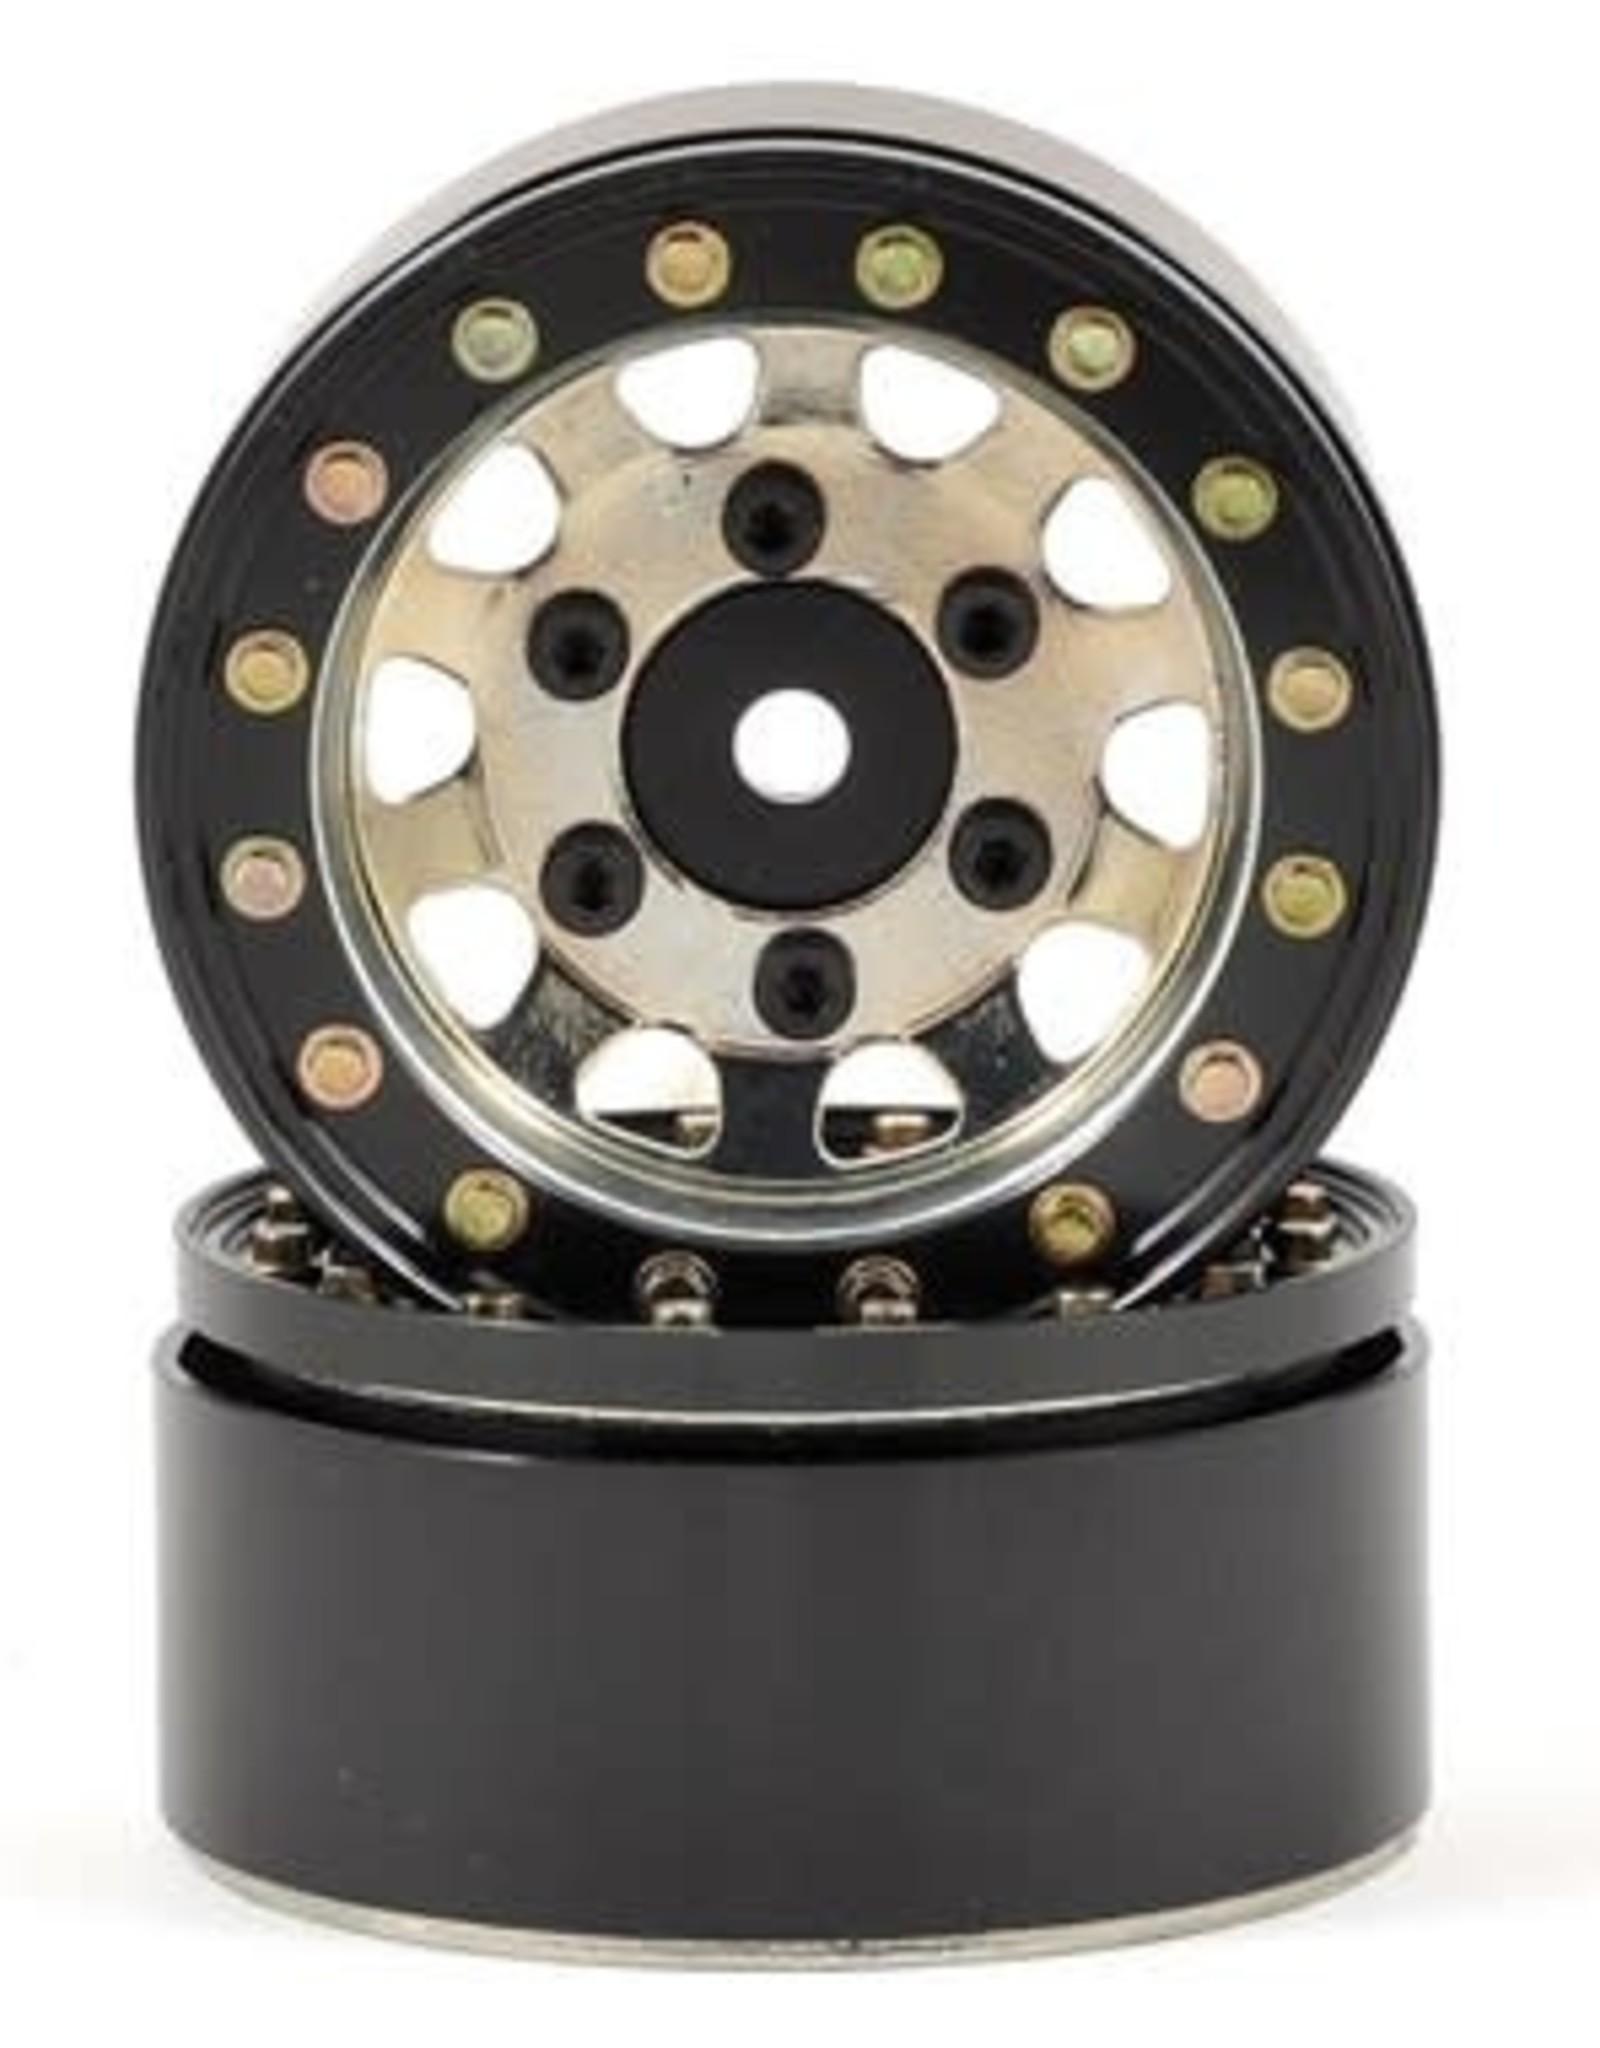 "SSD SSD RC D Hole 1.55"" Steel Beadlock Crawler Wheels (Silver) (2)"